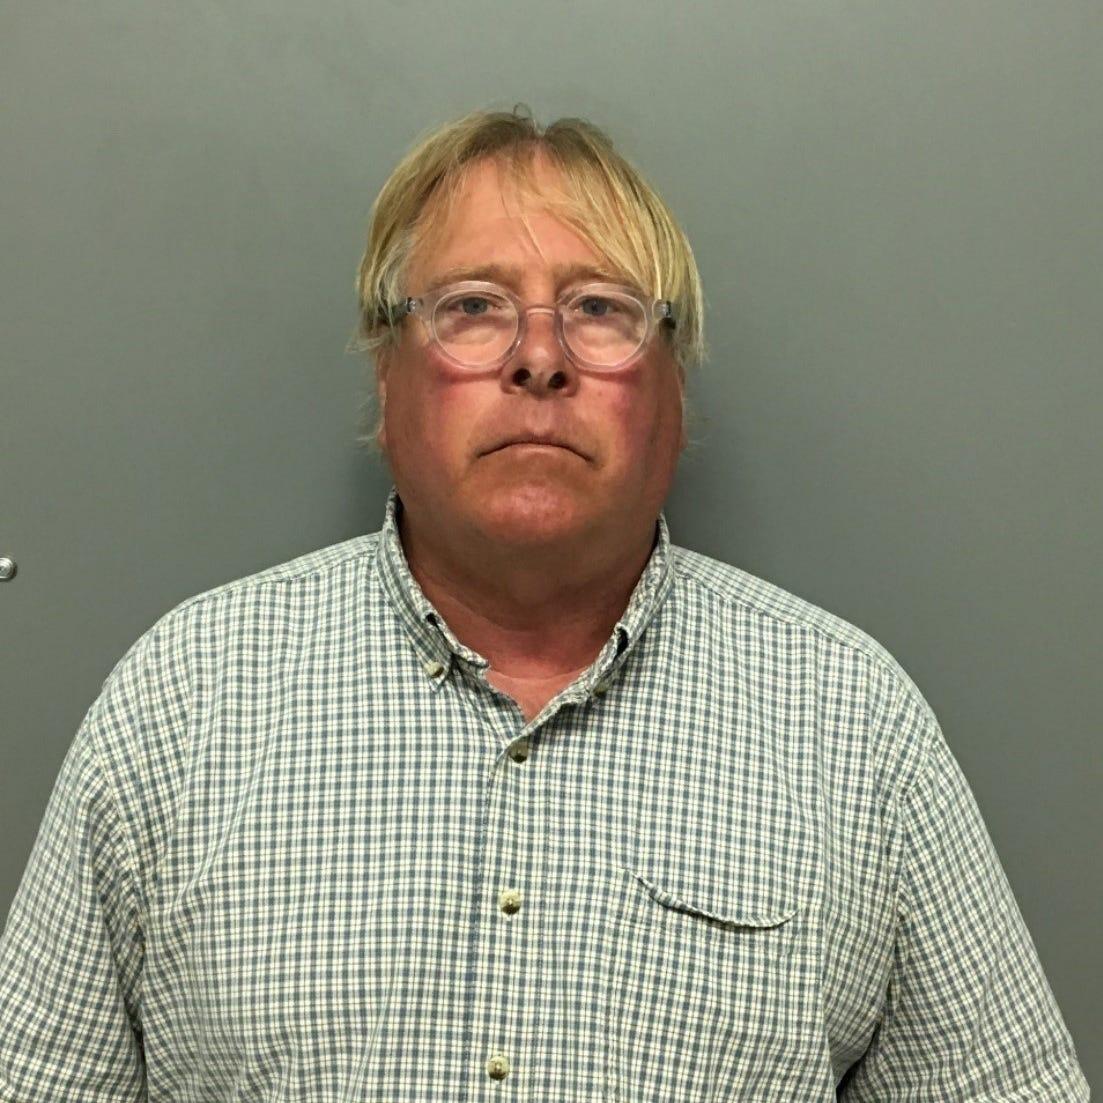 Bruce Deming, 64, of Burlington